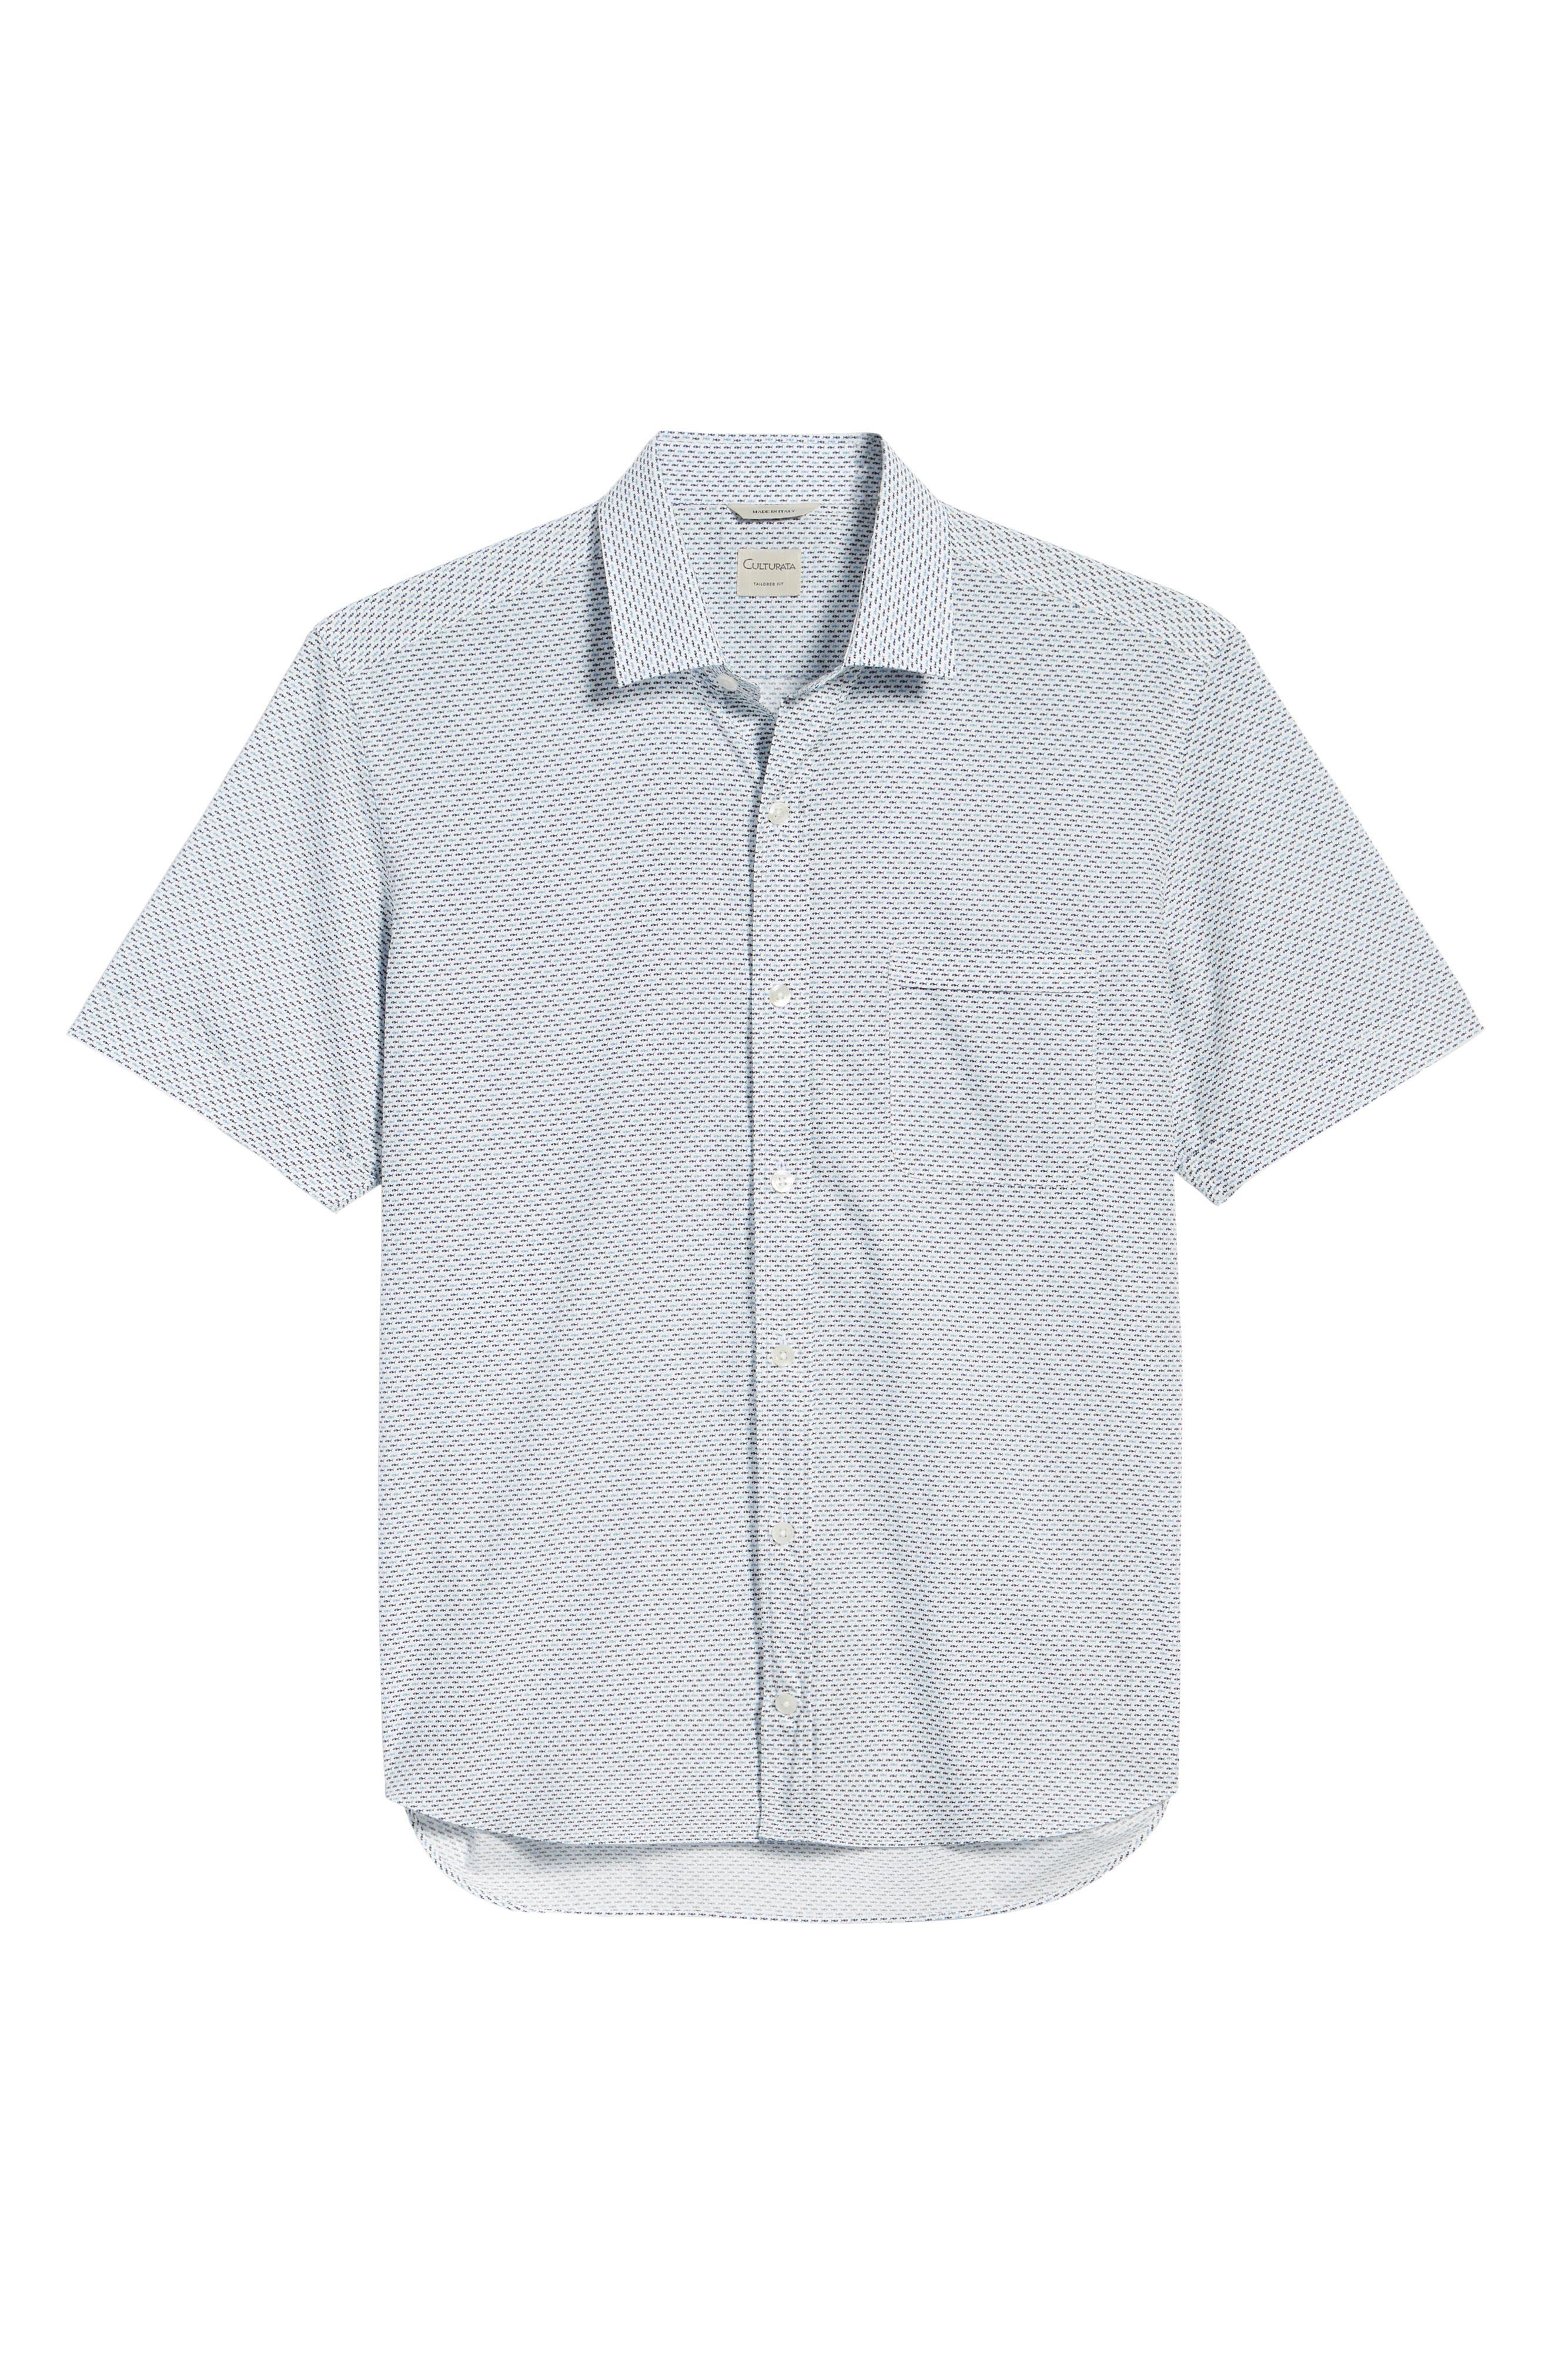 Trim Fit Fish Print Sport Shirt,                             Alternate thumbnail 6, color,                             White